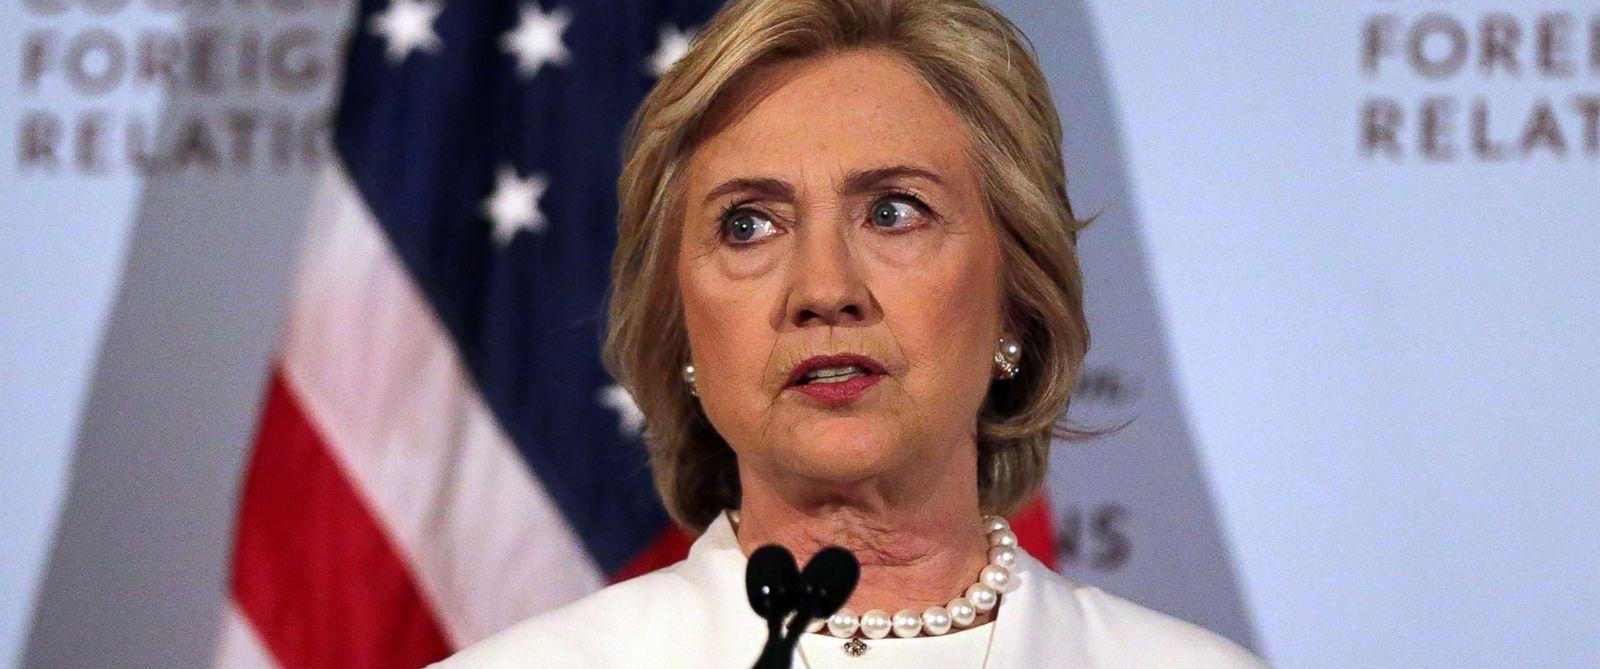 PHOTO: Hillary Clinton gives a speech, Nov. 19, 2015, in New York City.